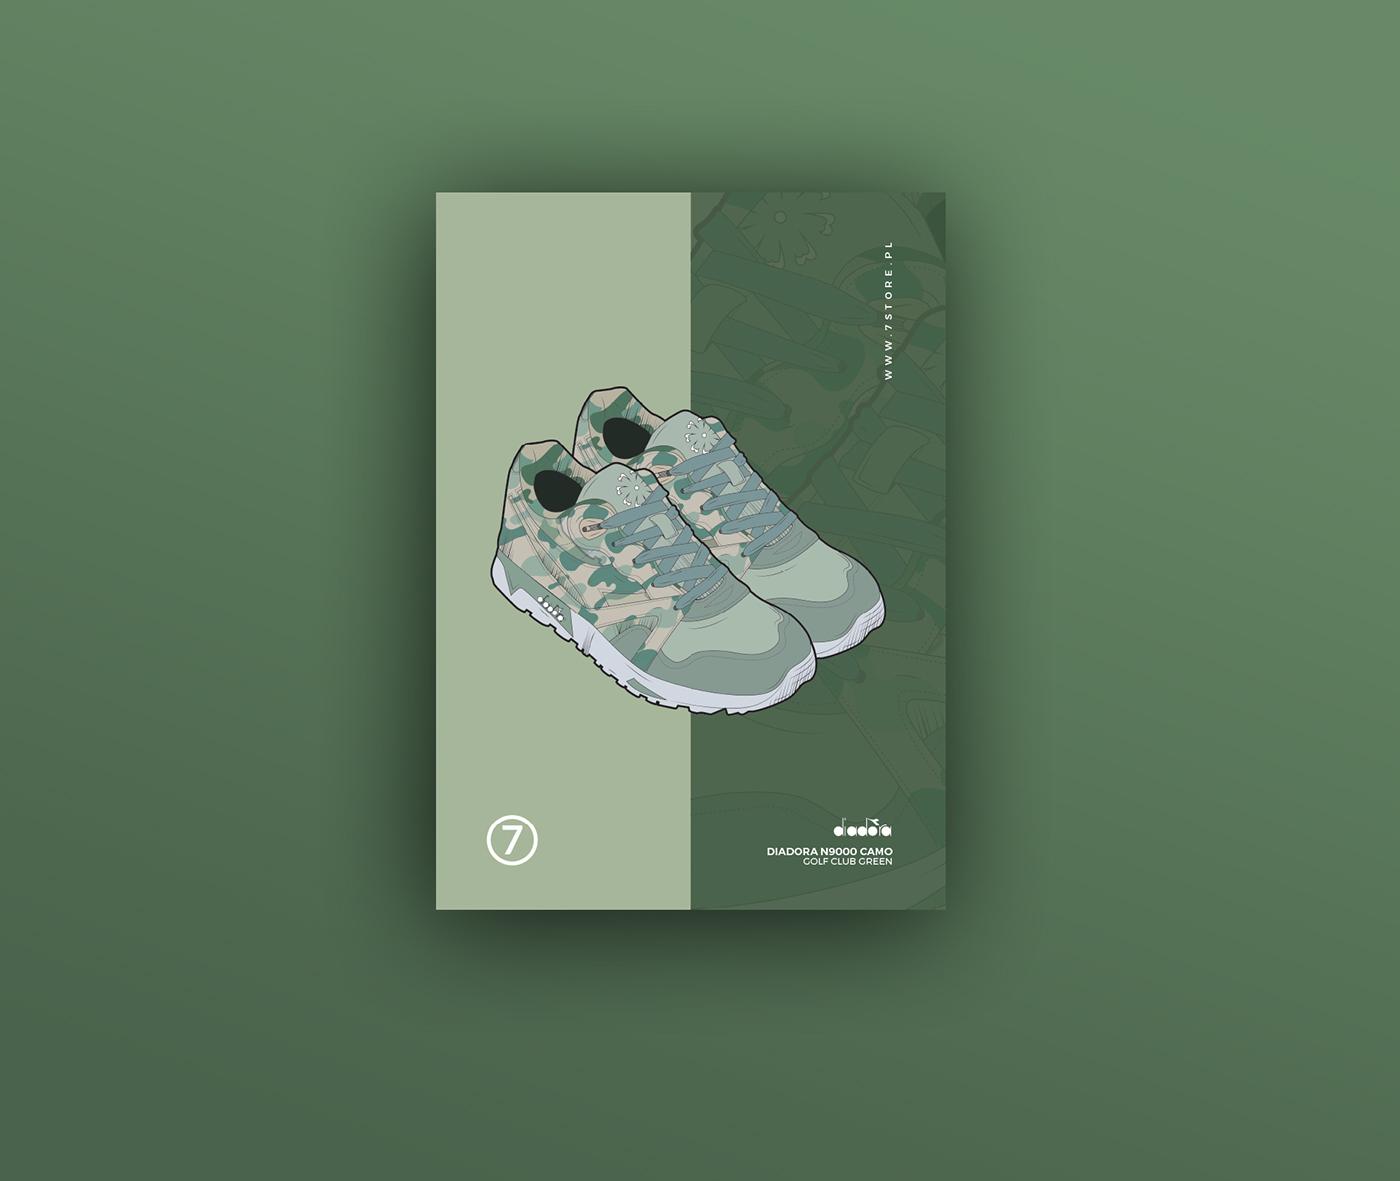 Poster Design flyer poster Shoes Poster sneakers adidas New Balance Diadora Vans